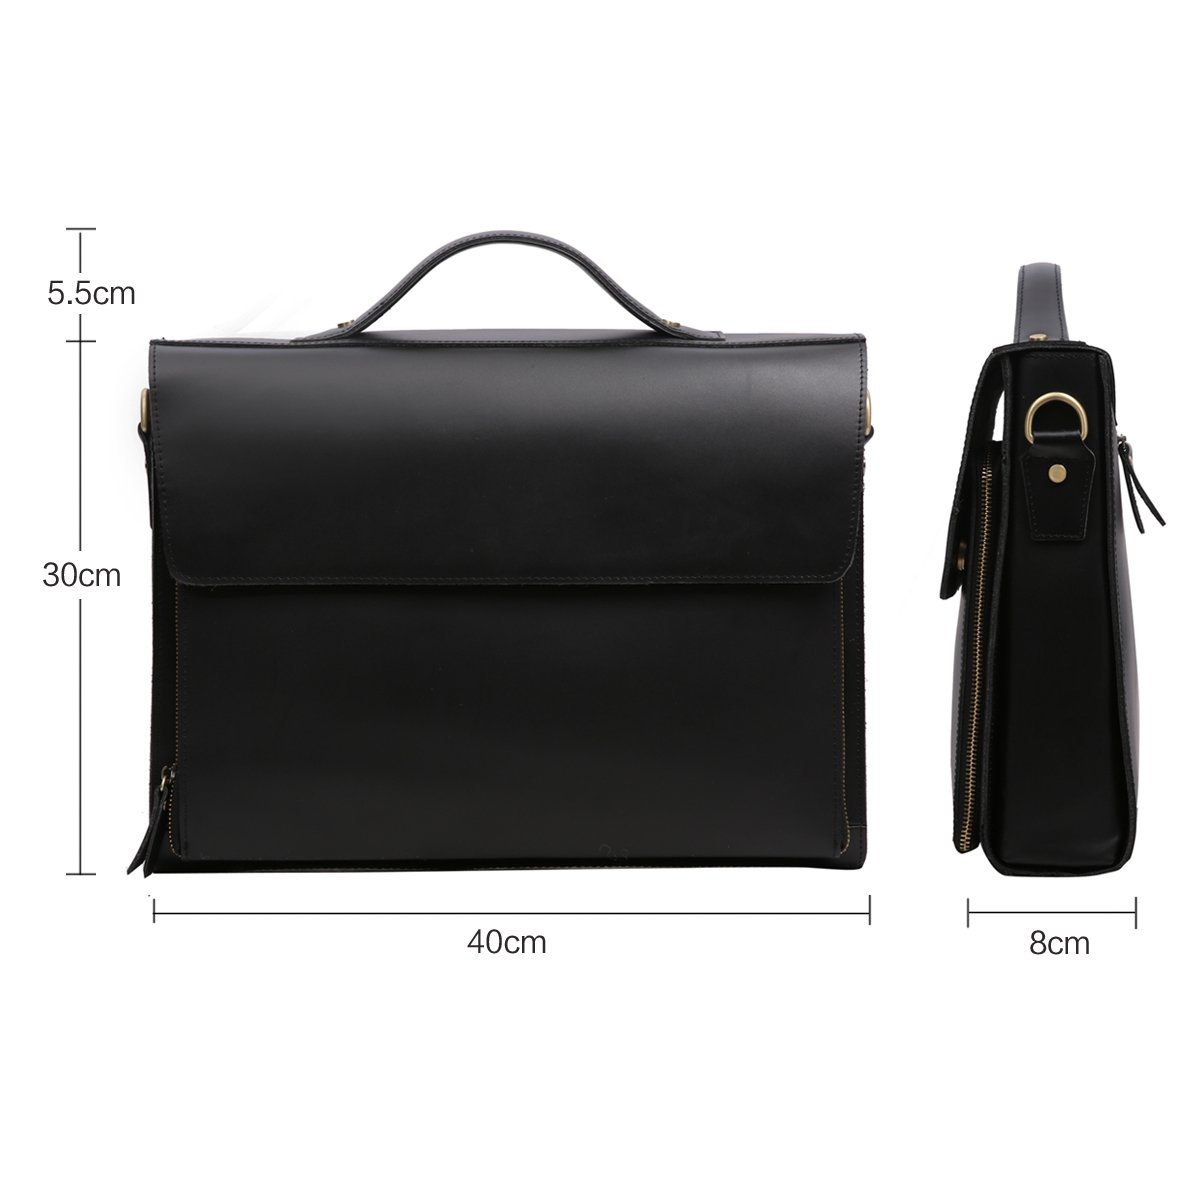 Leathario Leather Briefcase for Men Leather Laptop Bag Shoulder Messenger Bag Business Work Bag by Leathario (Image #1)